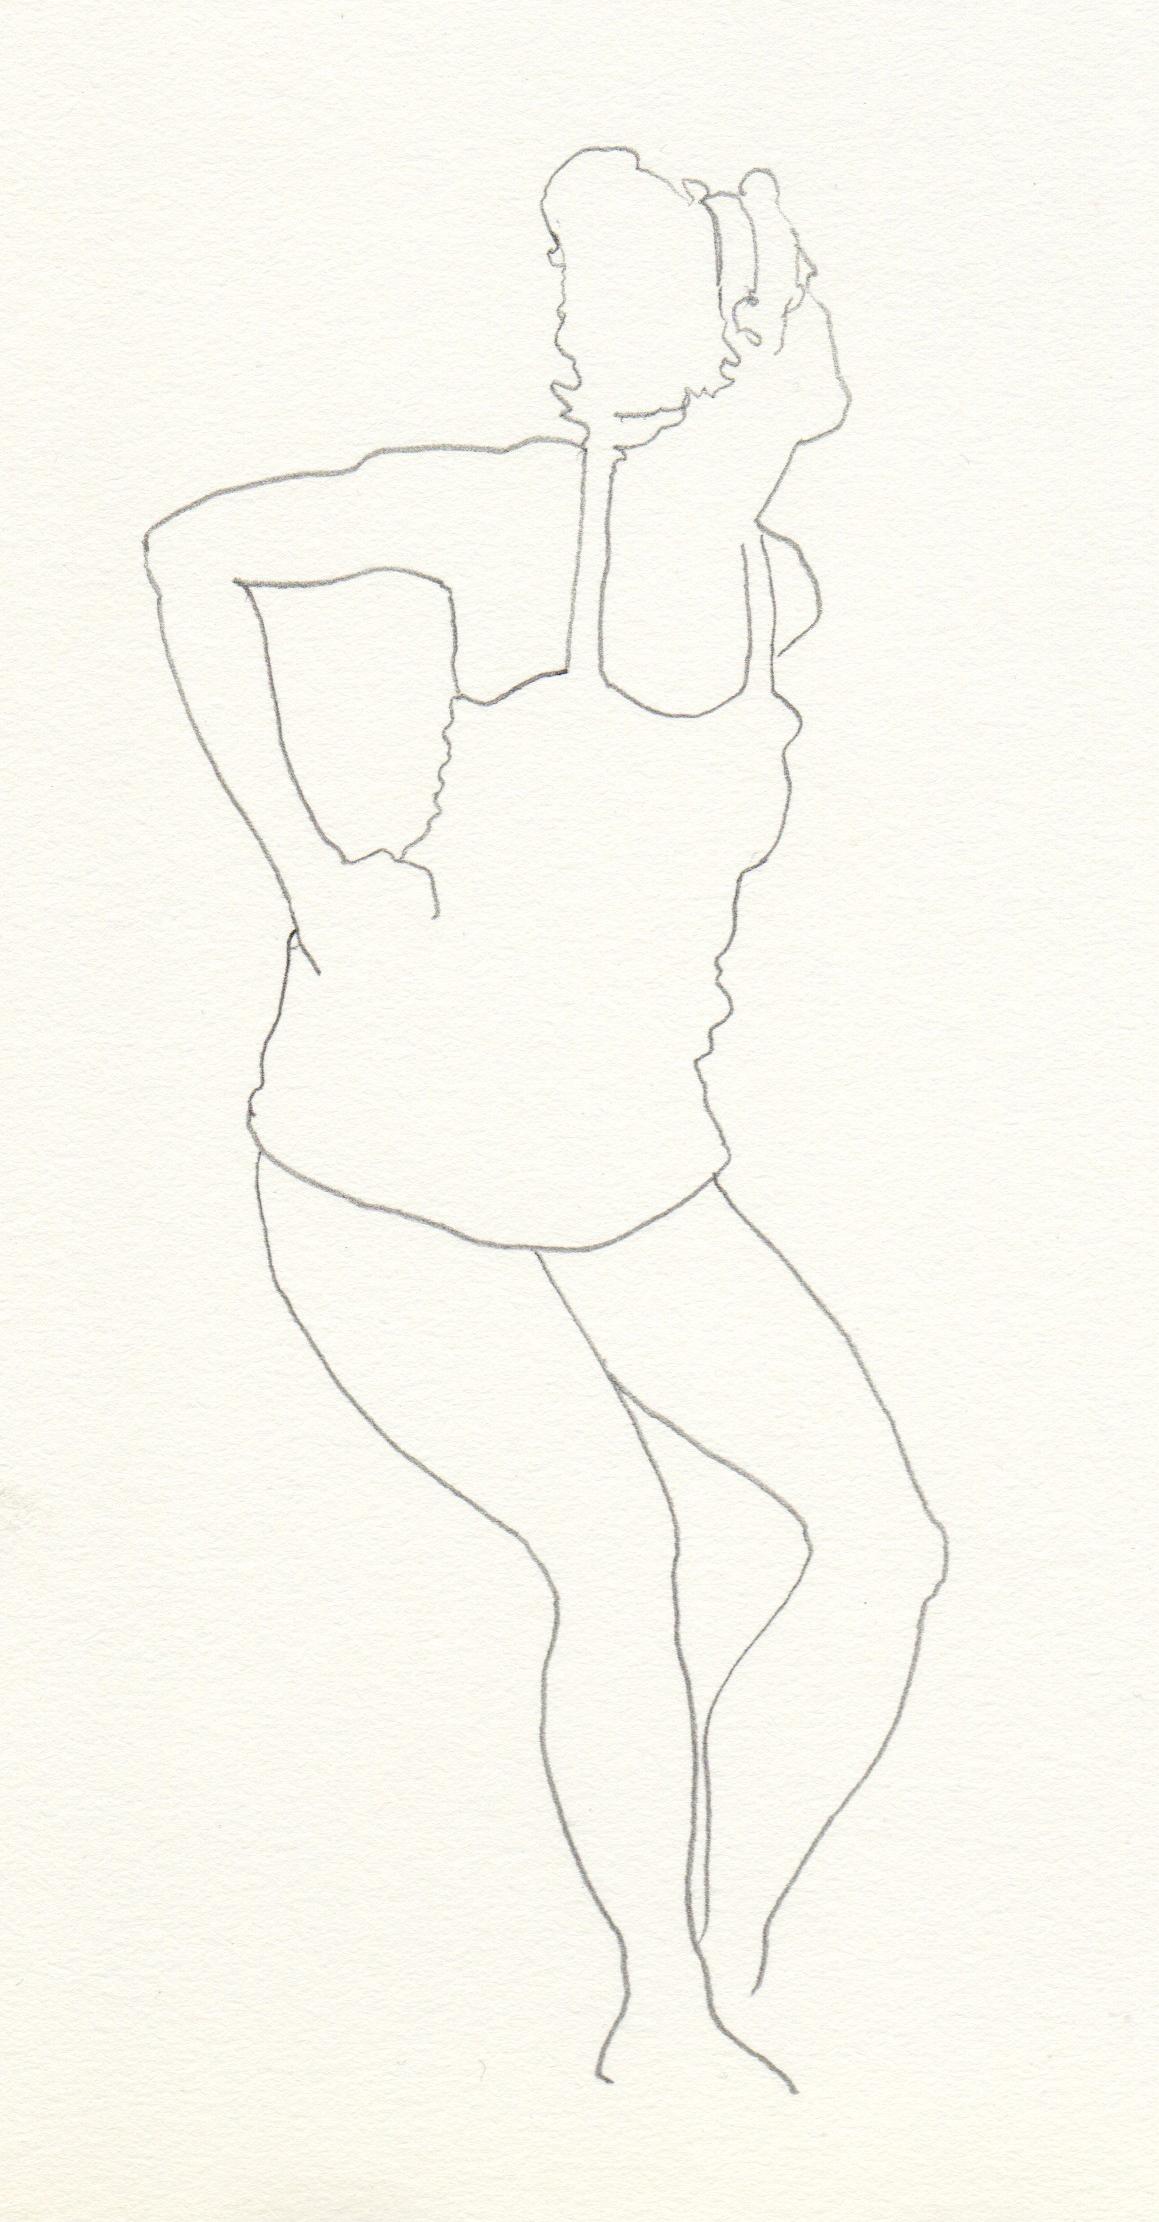 2012_Sketch_F-Beudin_045